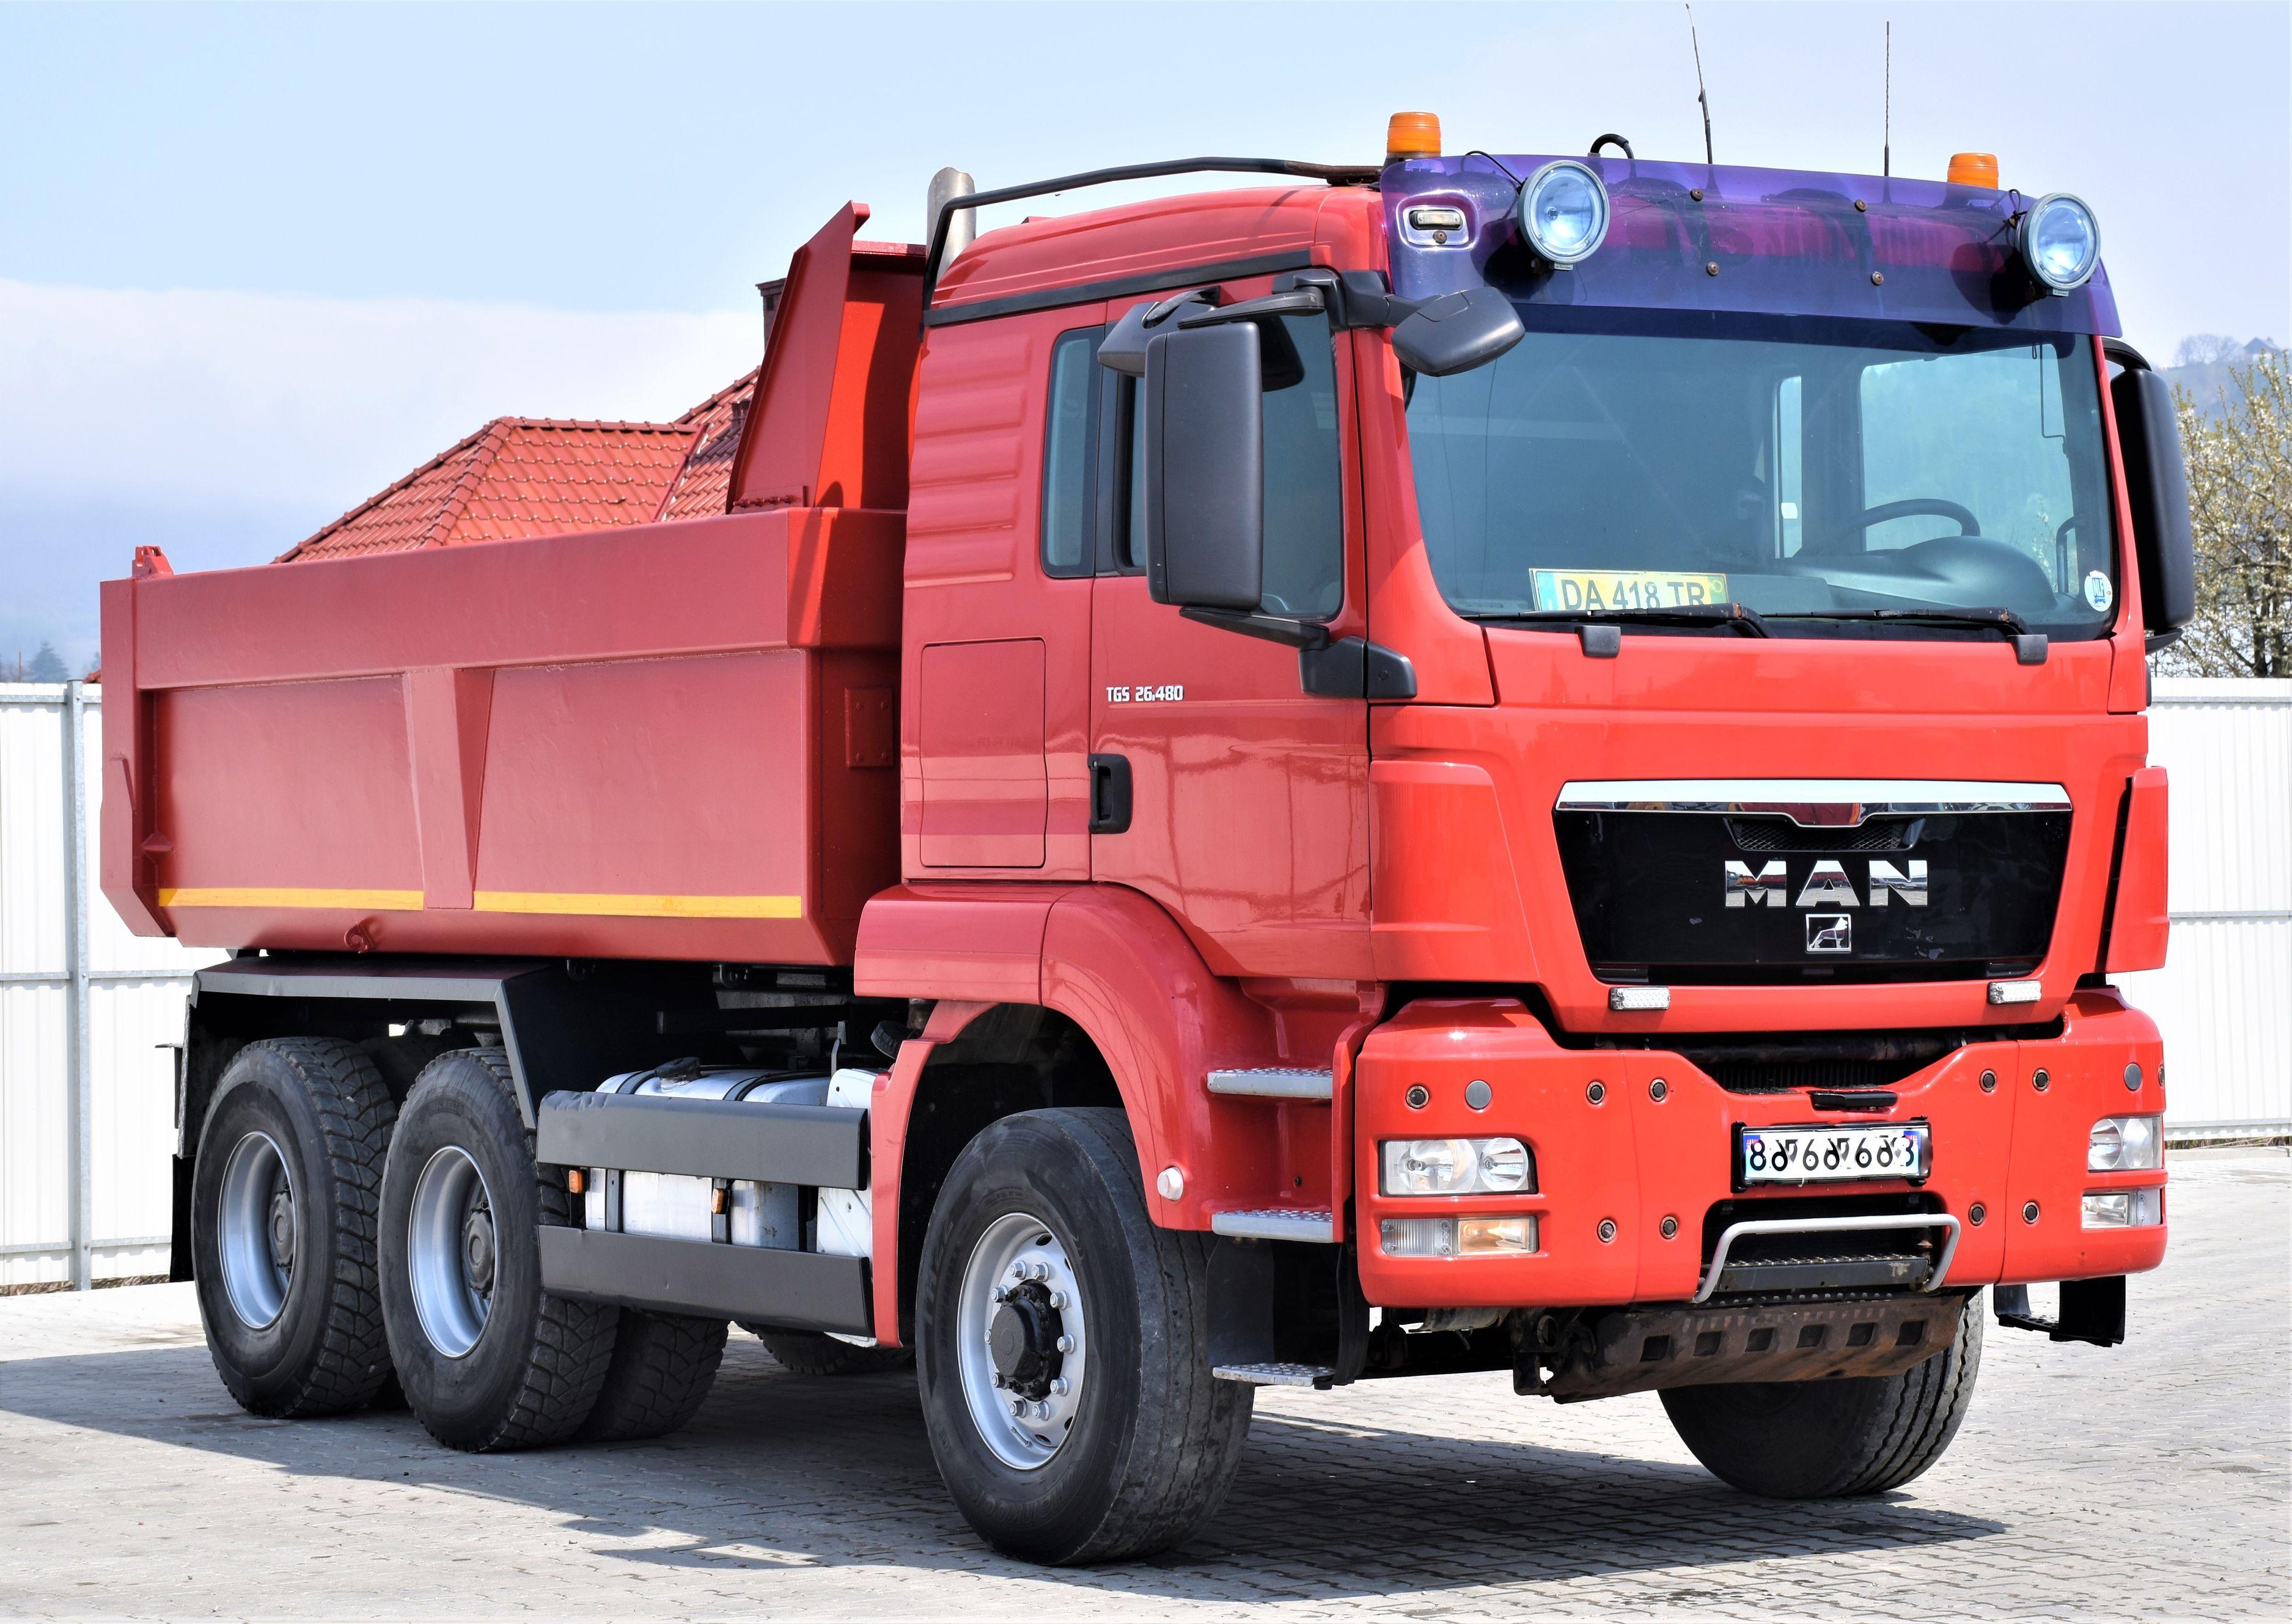 2009-man-tgs-26-480-373764-equipment-cover-image